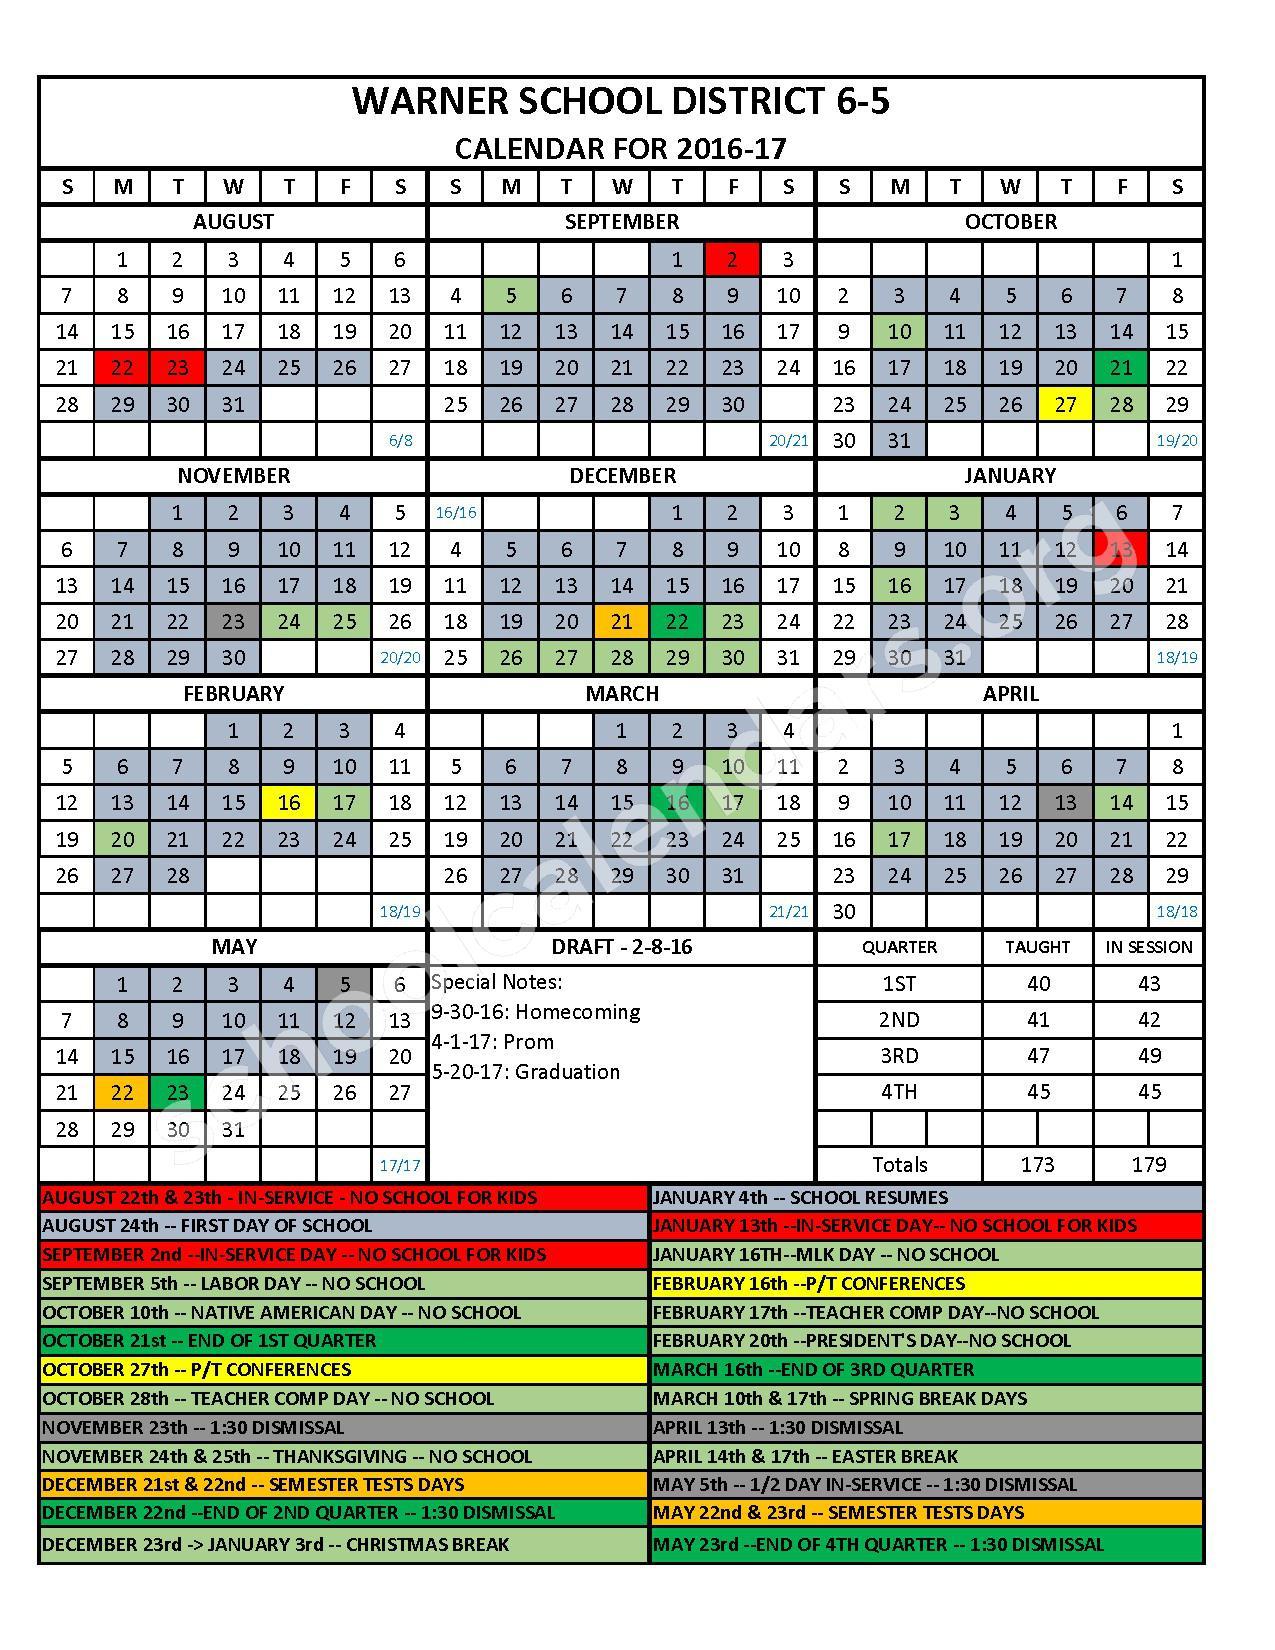 2016 - 2017 School Calendar – Warner School District 06-5 – page 1